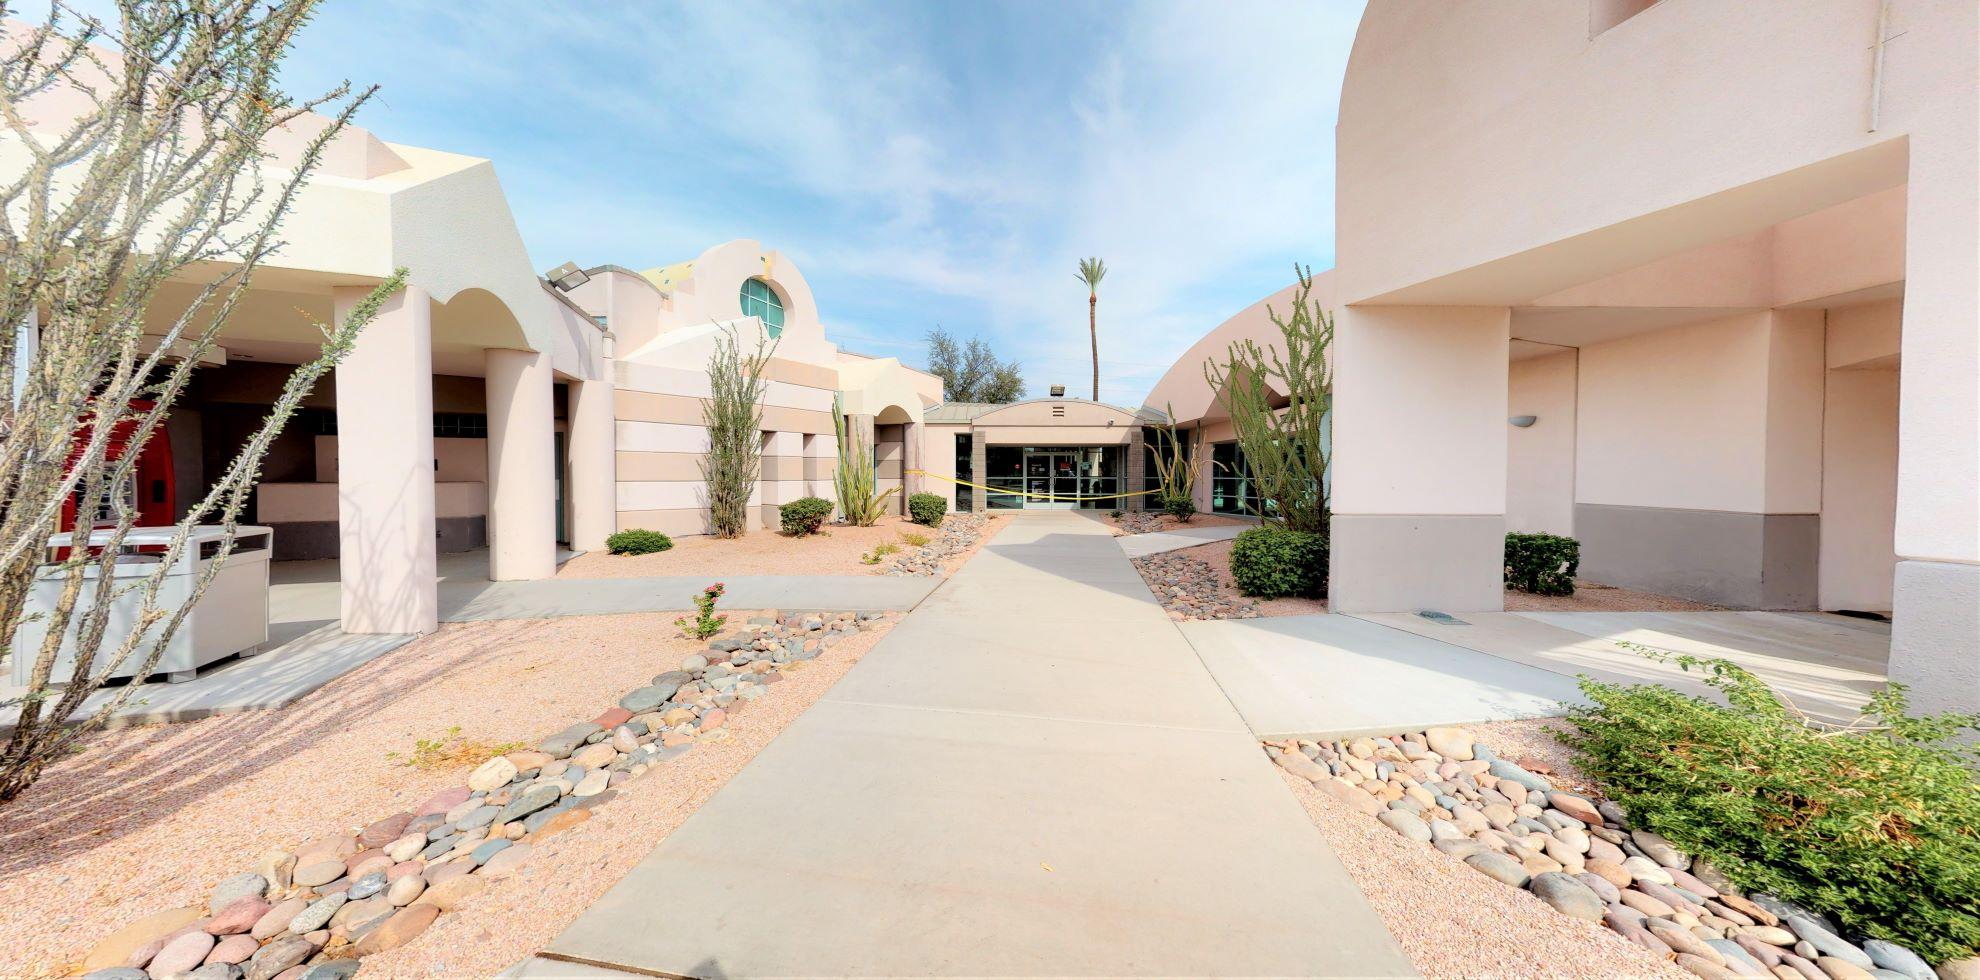 Bank of America financial center with drive-thru ATM | 1210 S Power Rd, Mesa, AZ 85206